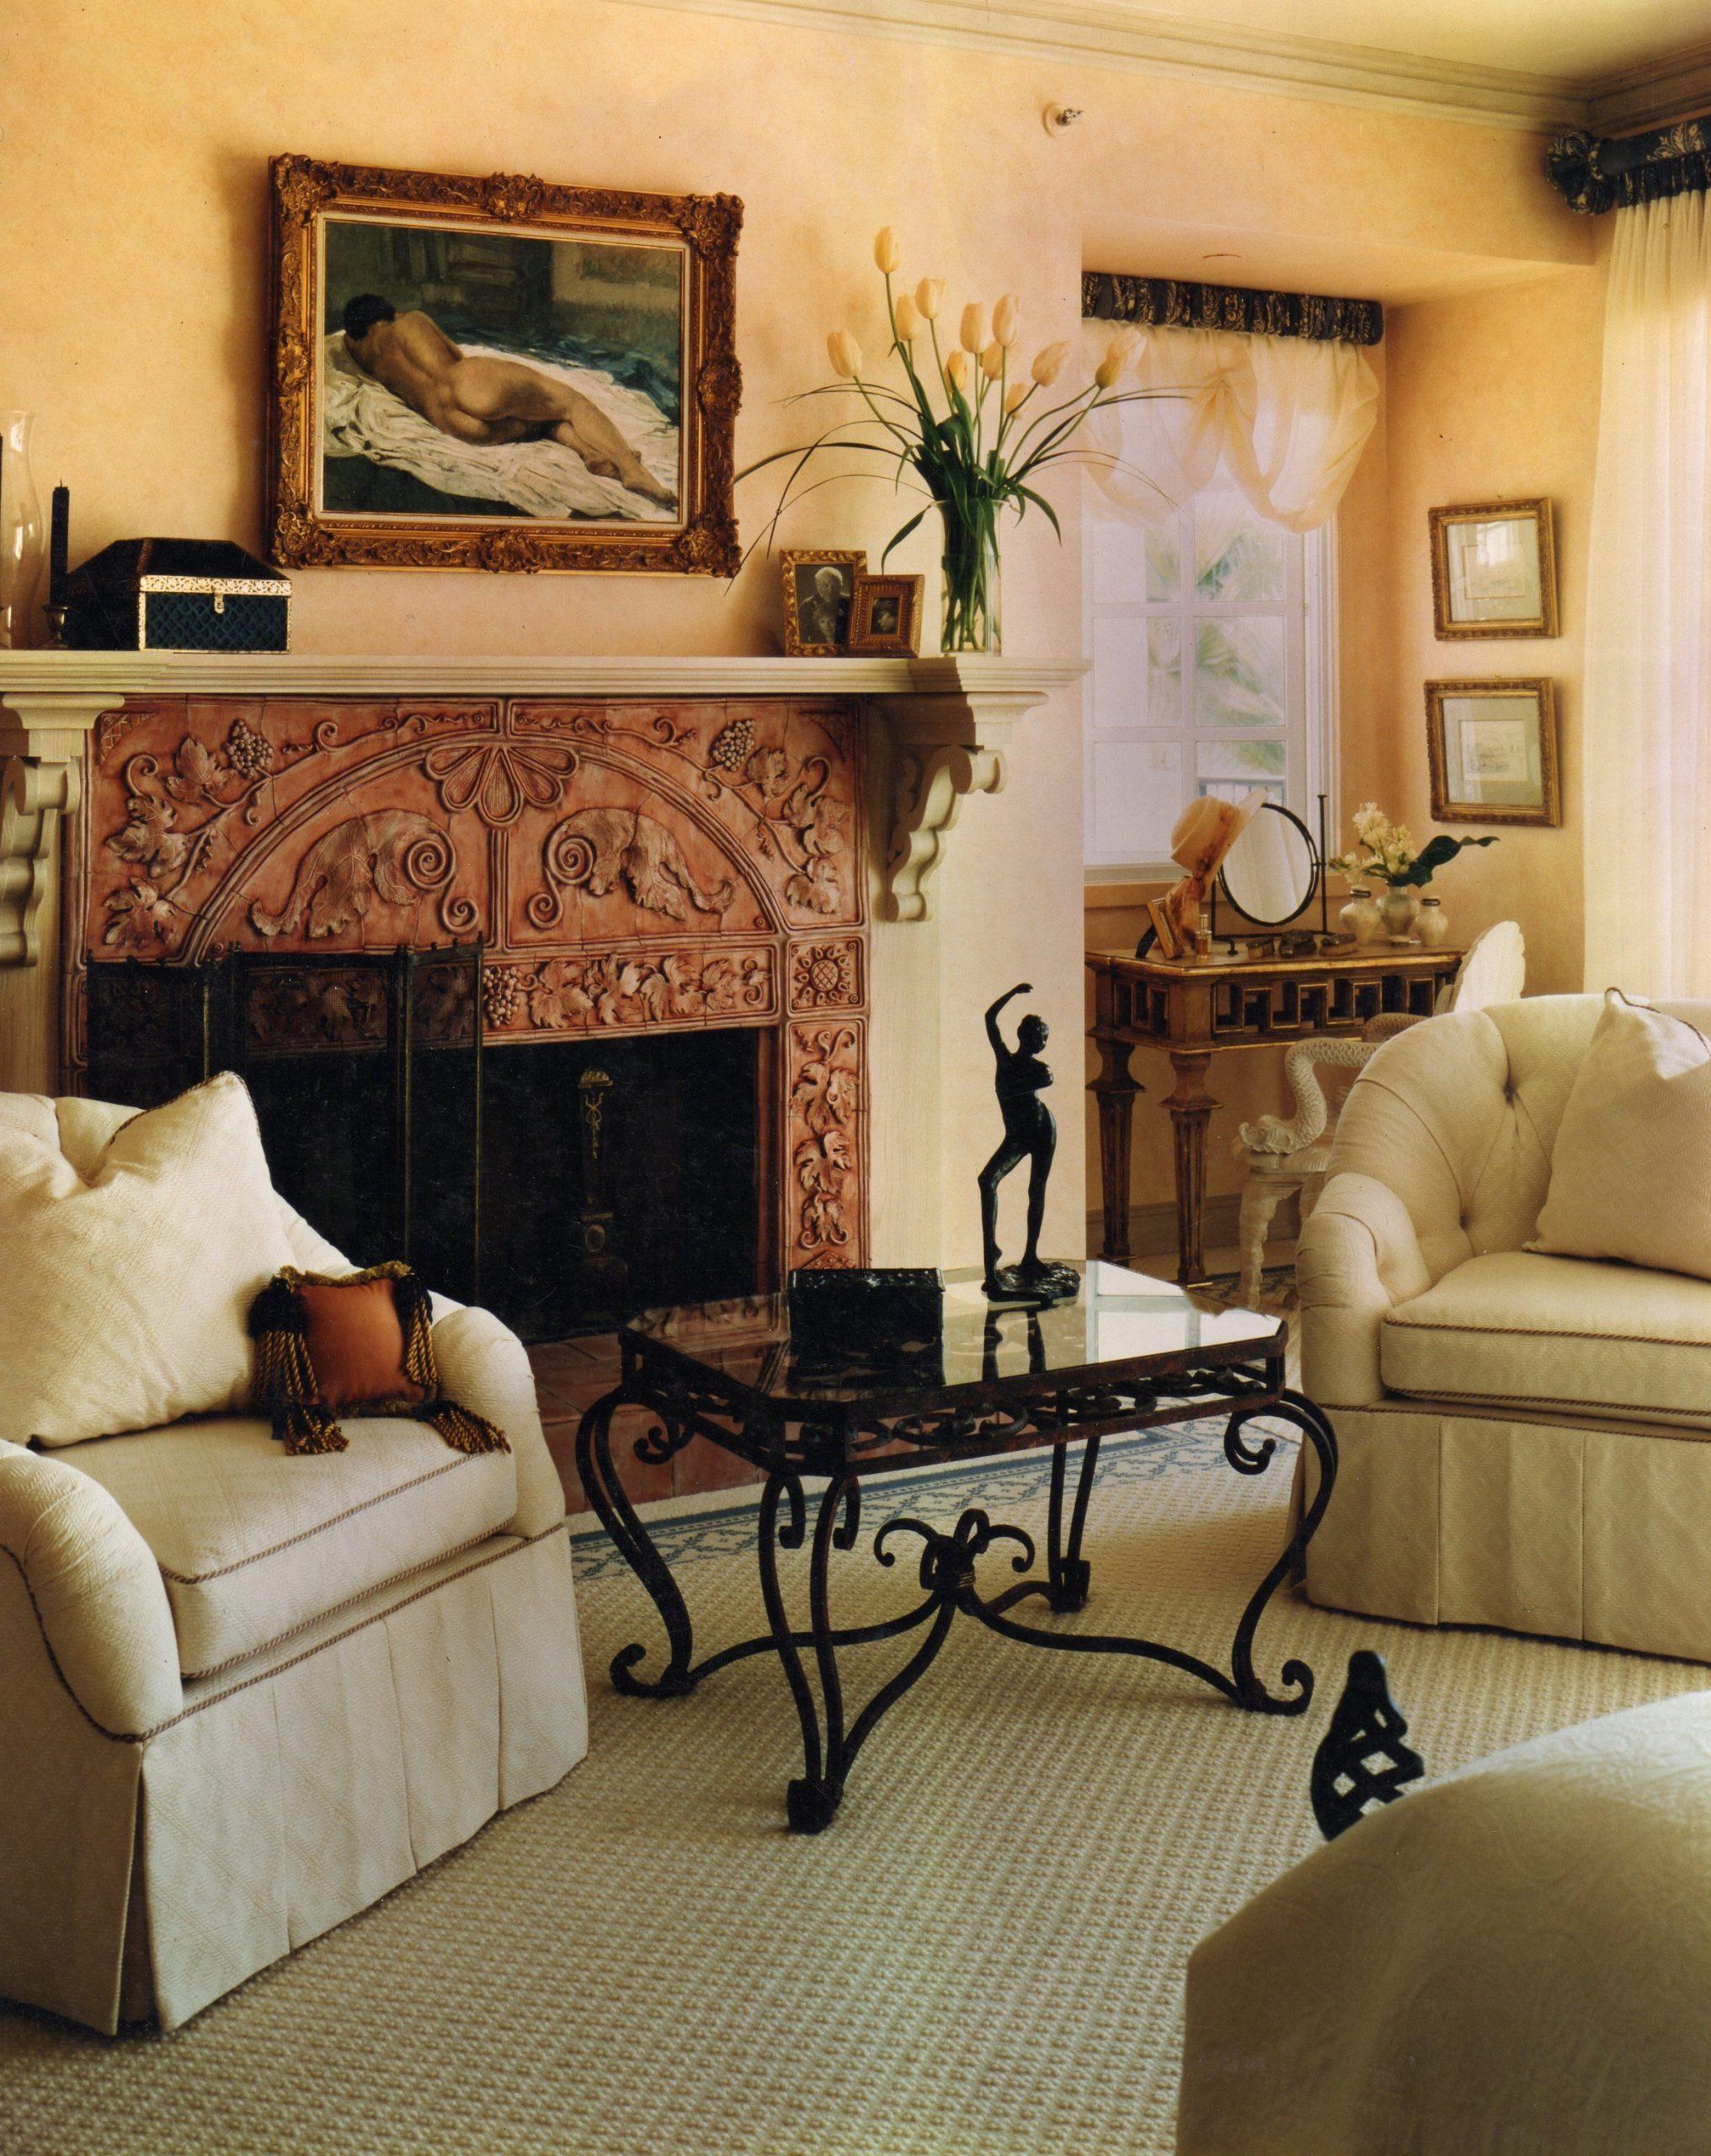 Terra cotta Fireplace